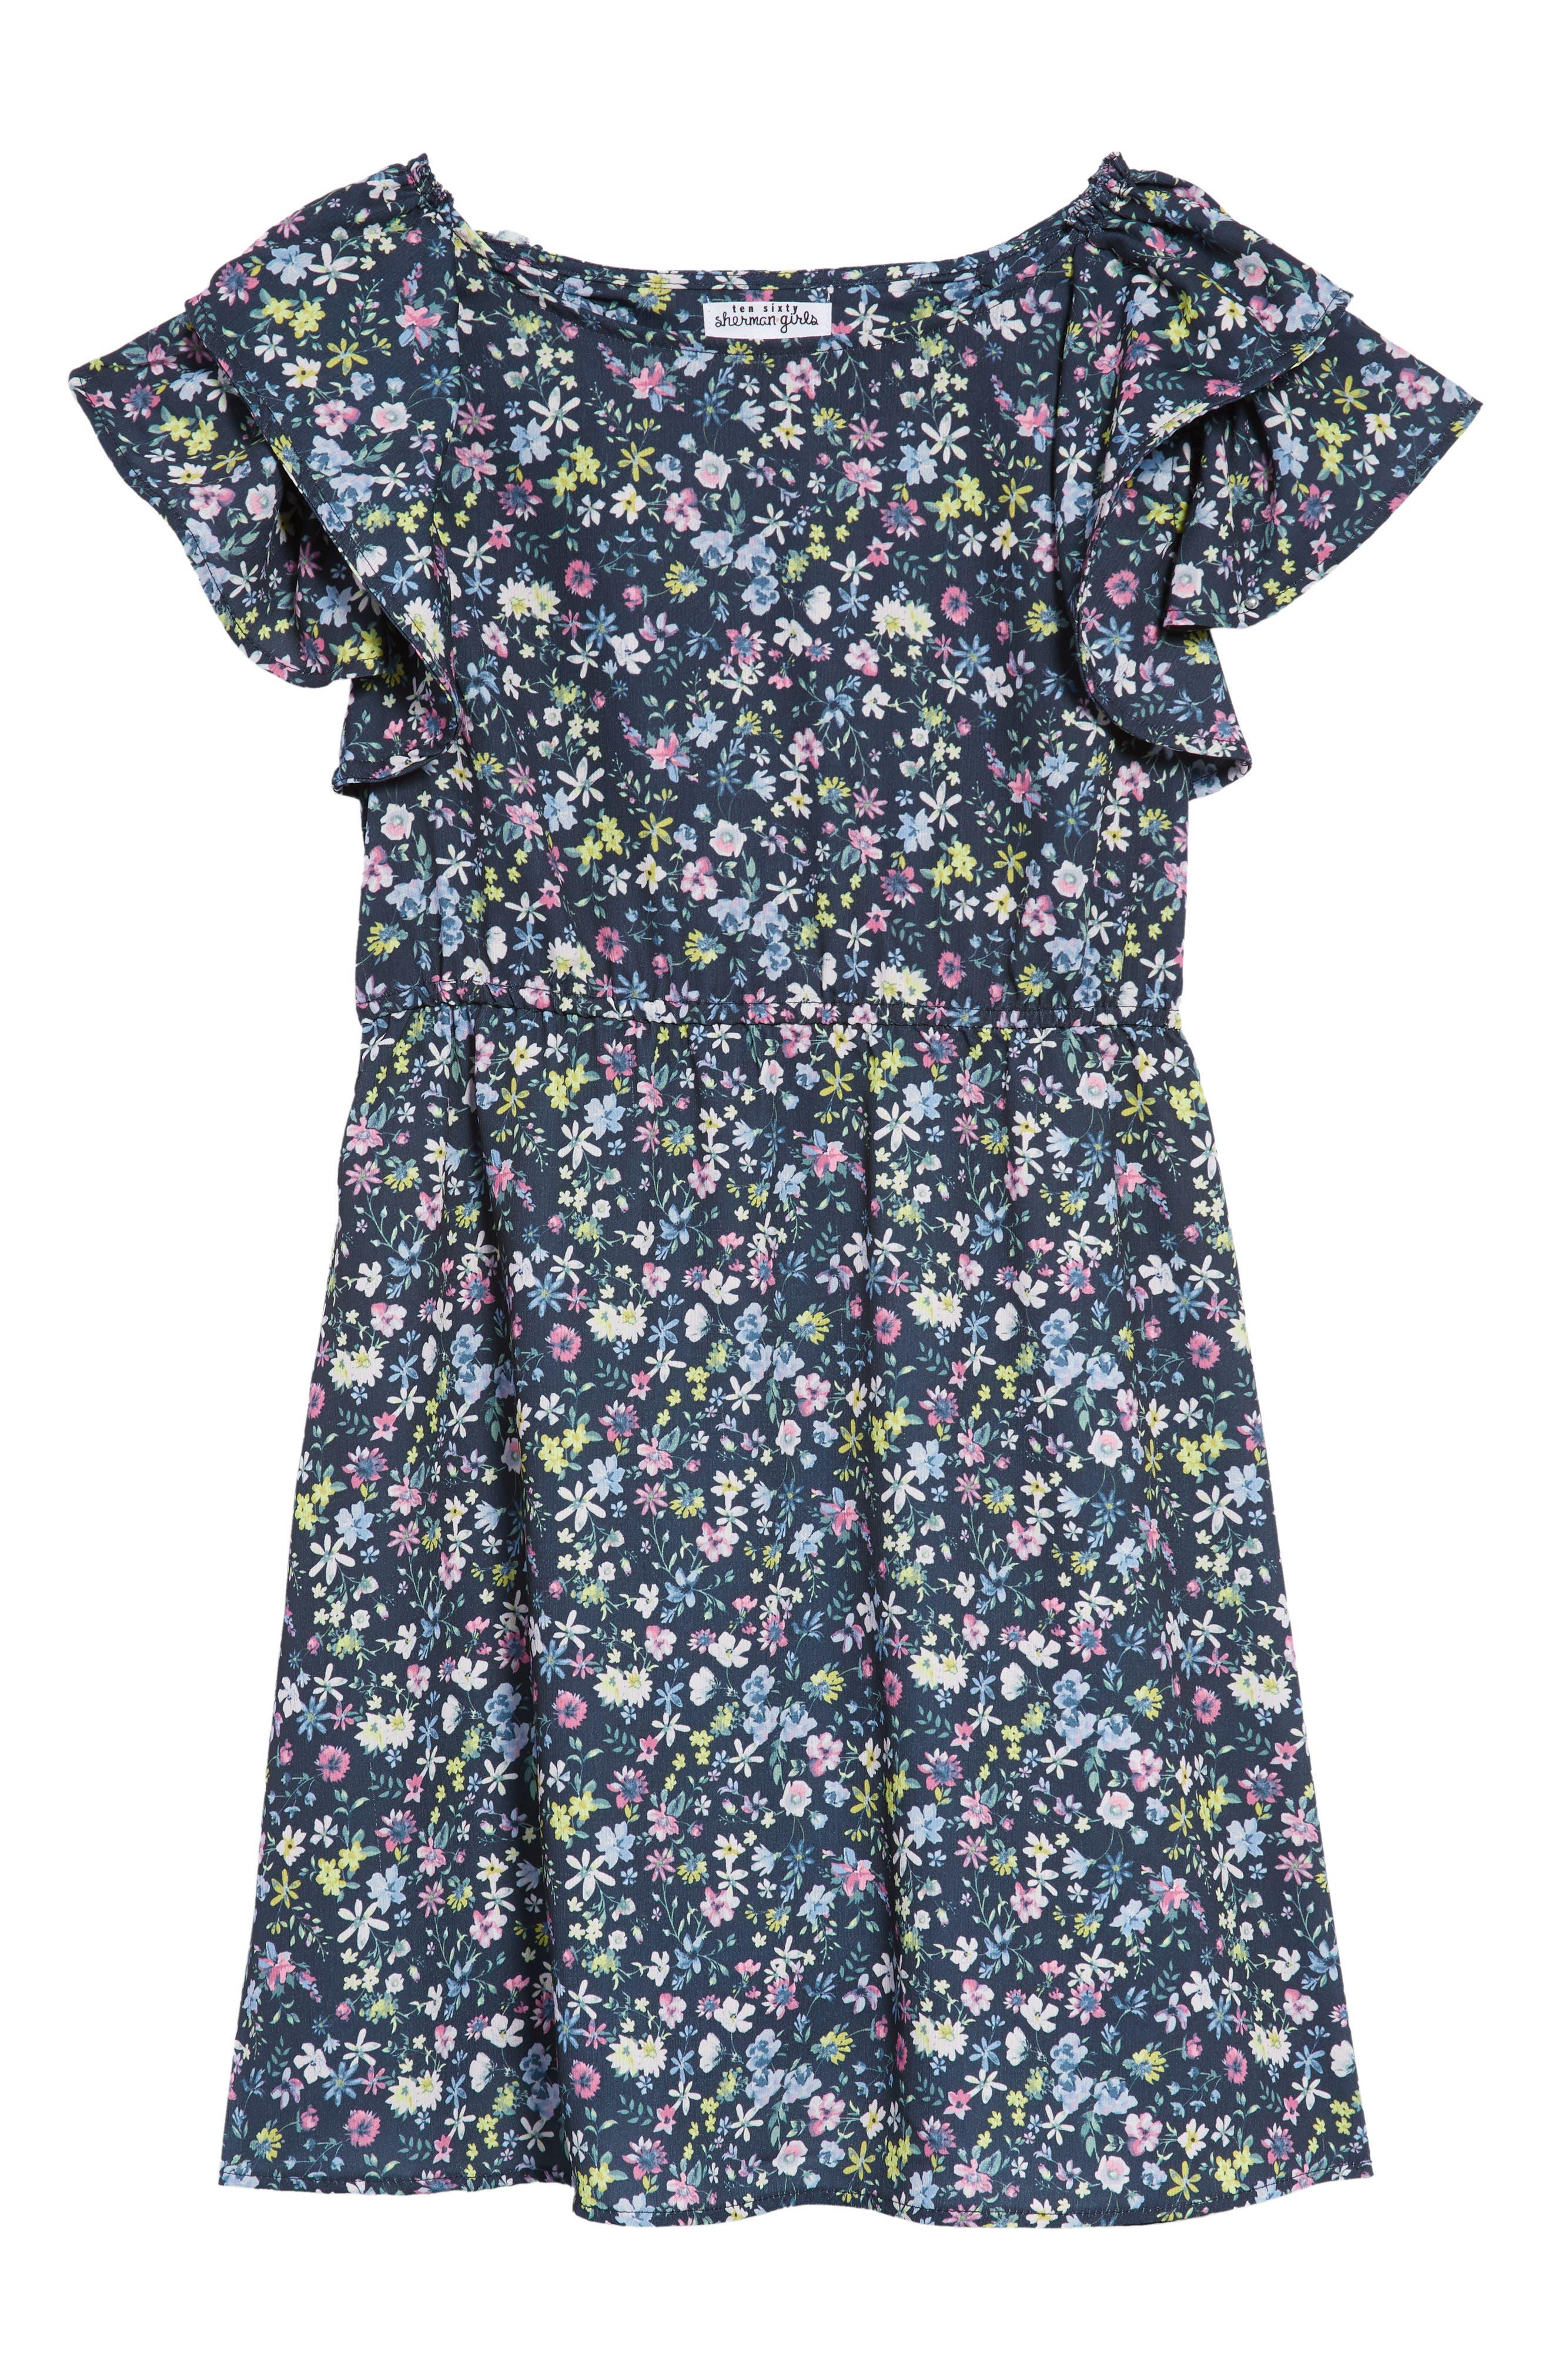 Ruffle Sleeve Floral Print Dress,                         Main,                         color, Navy